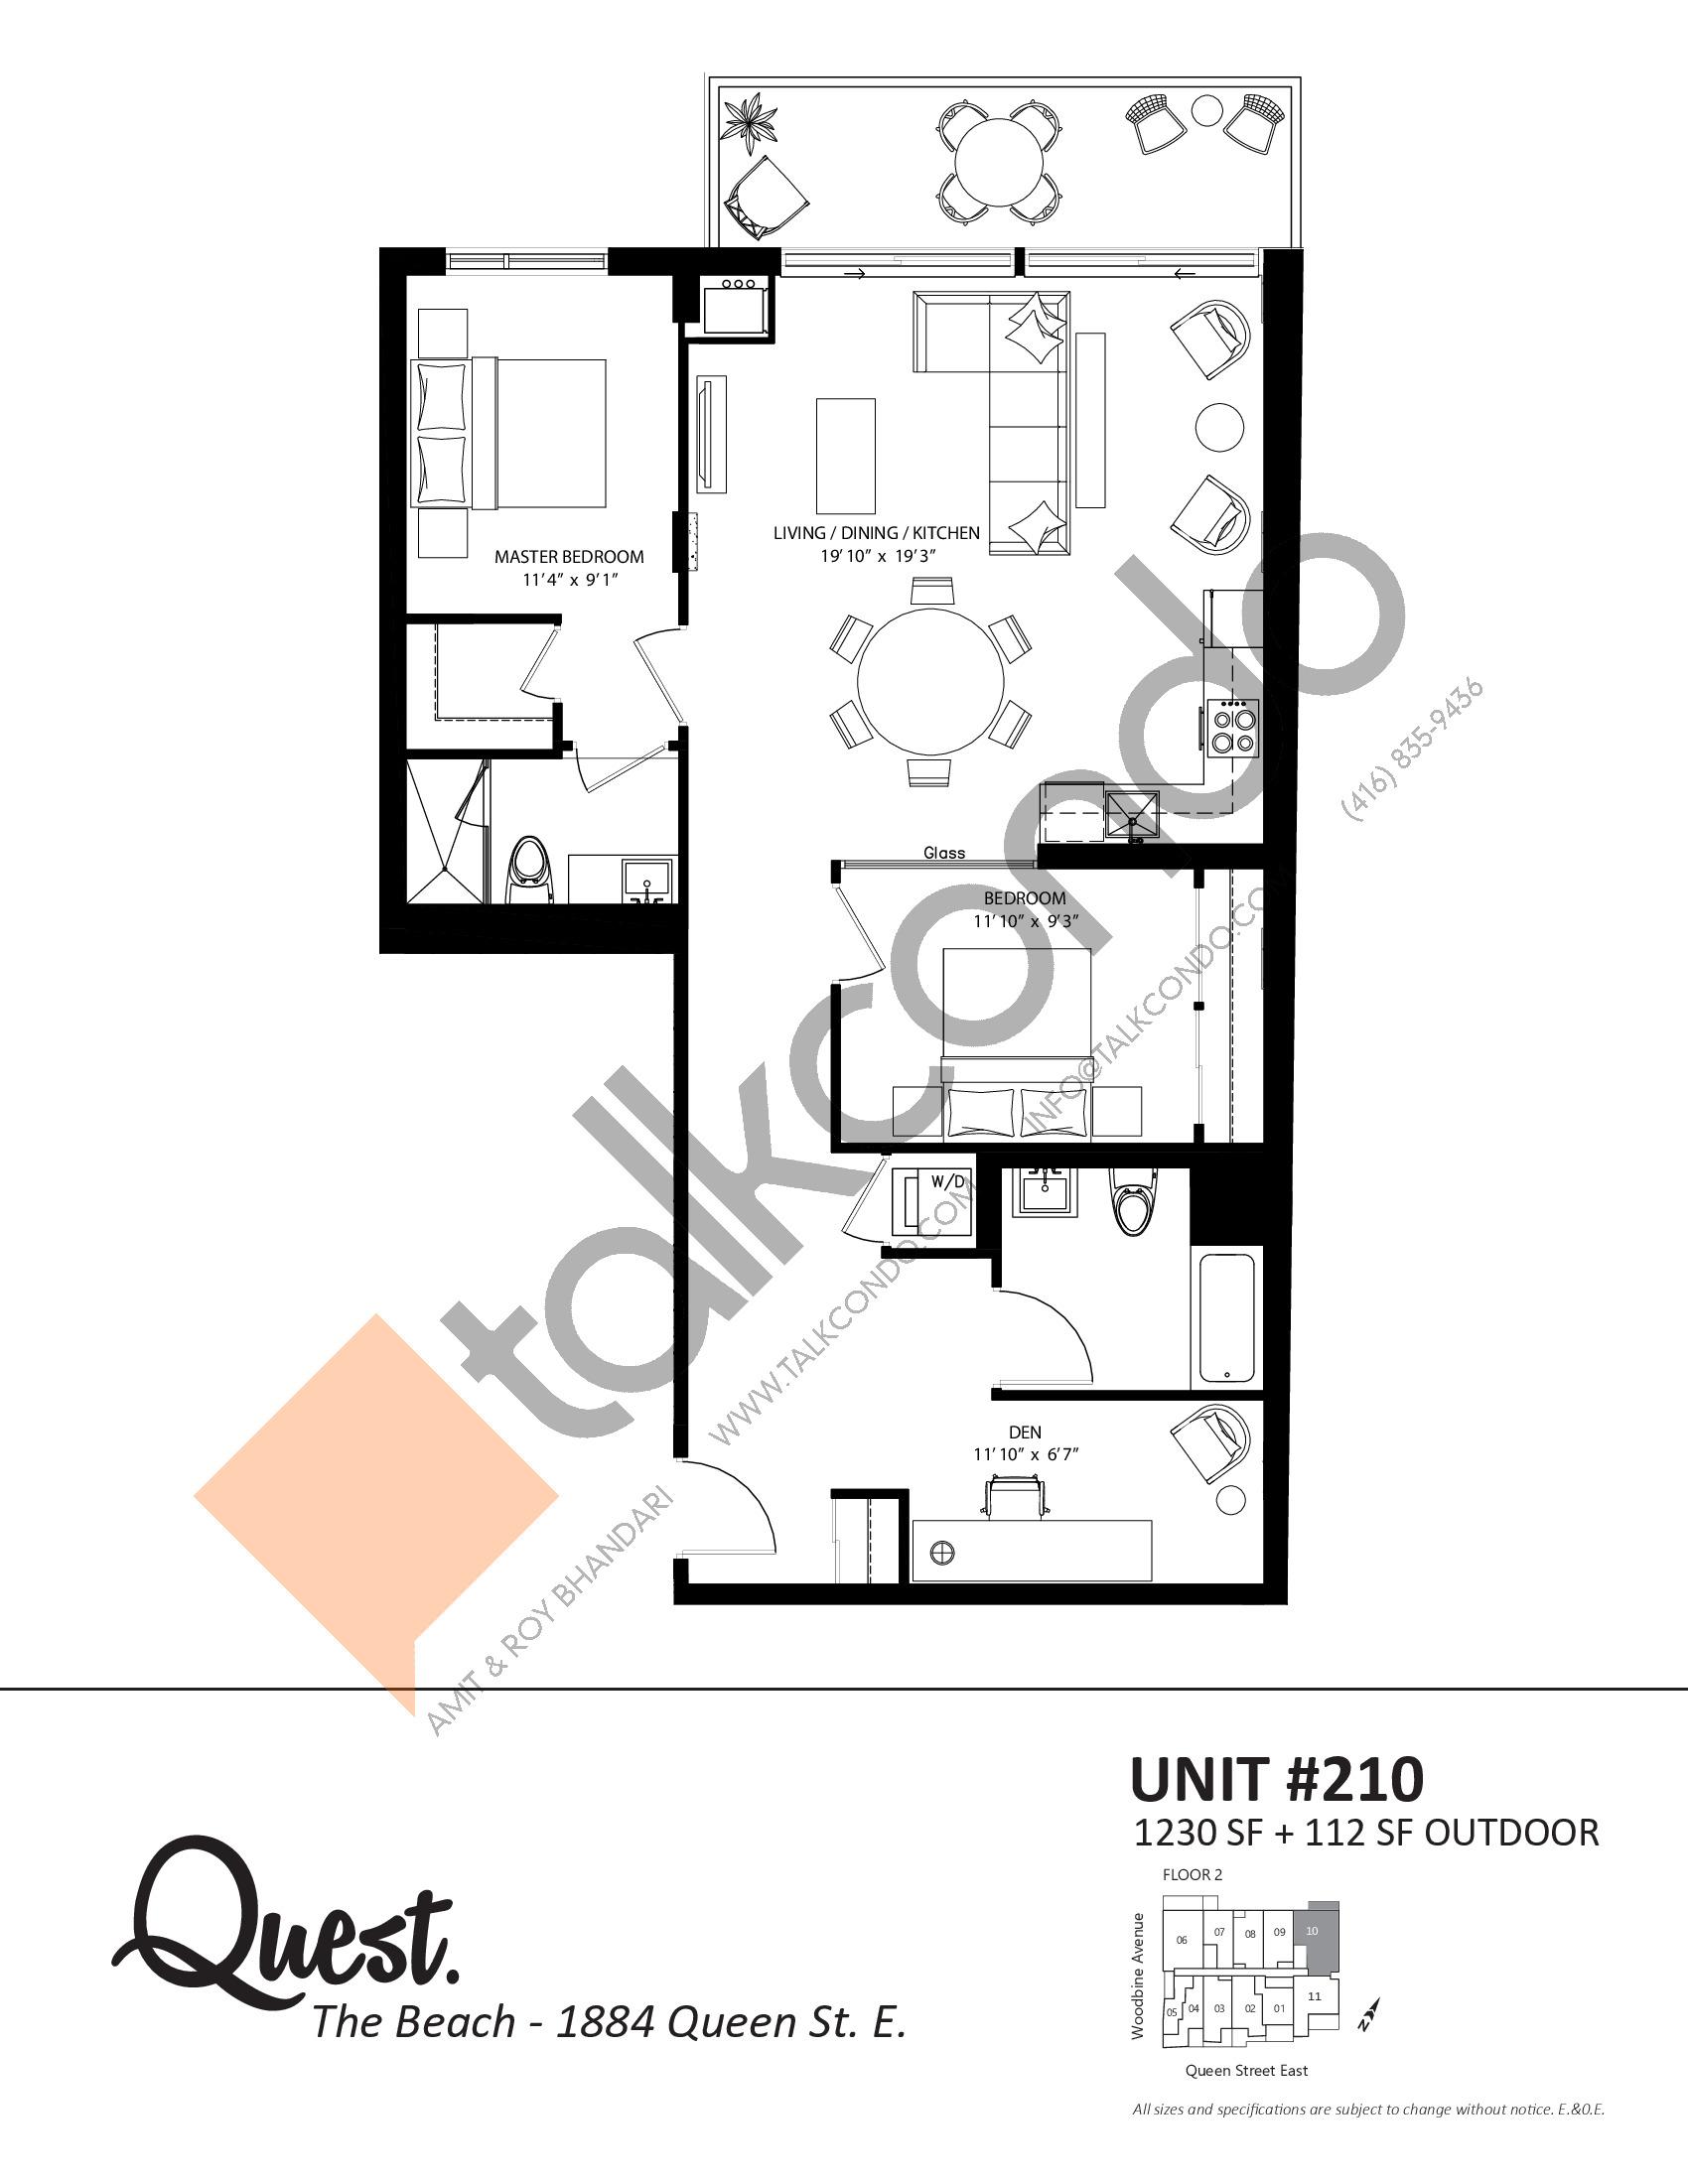 Unit 210 Floor Plan at Heartwood the Beach Condos - 1230 sq.ft